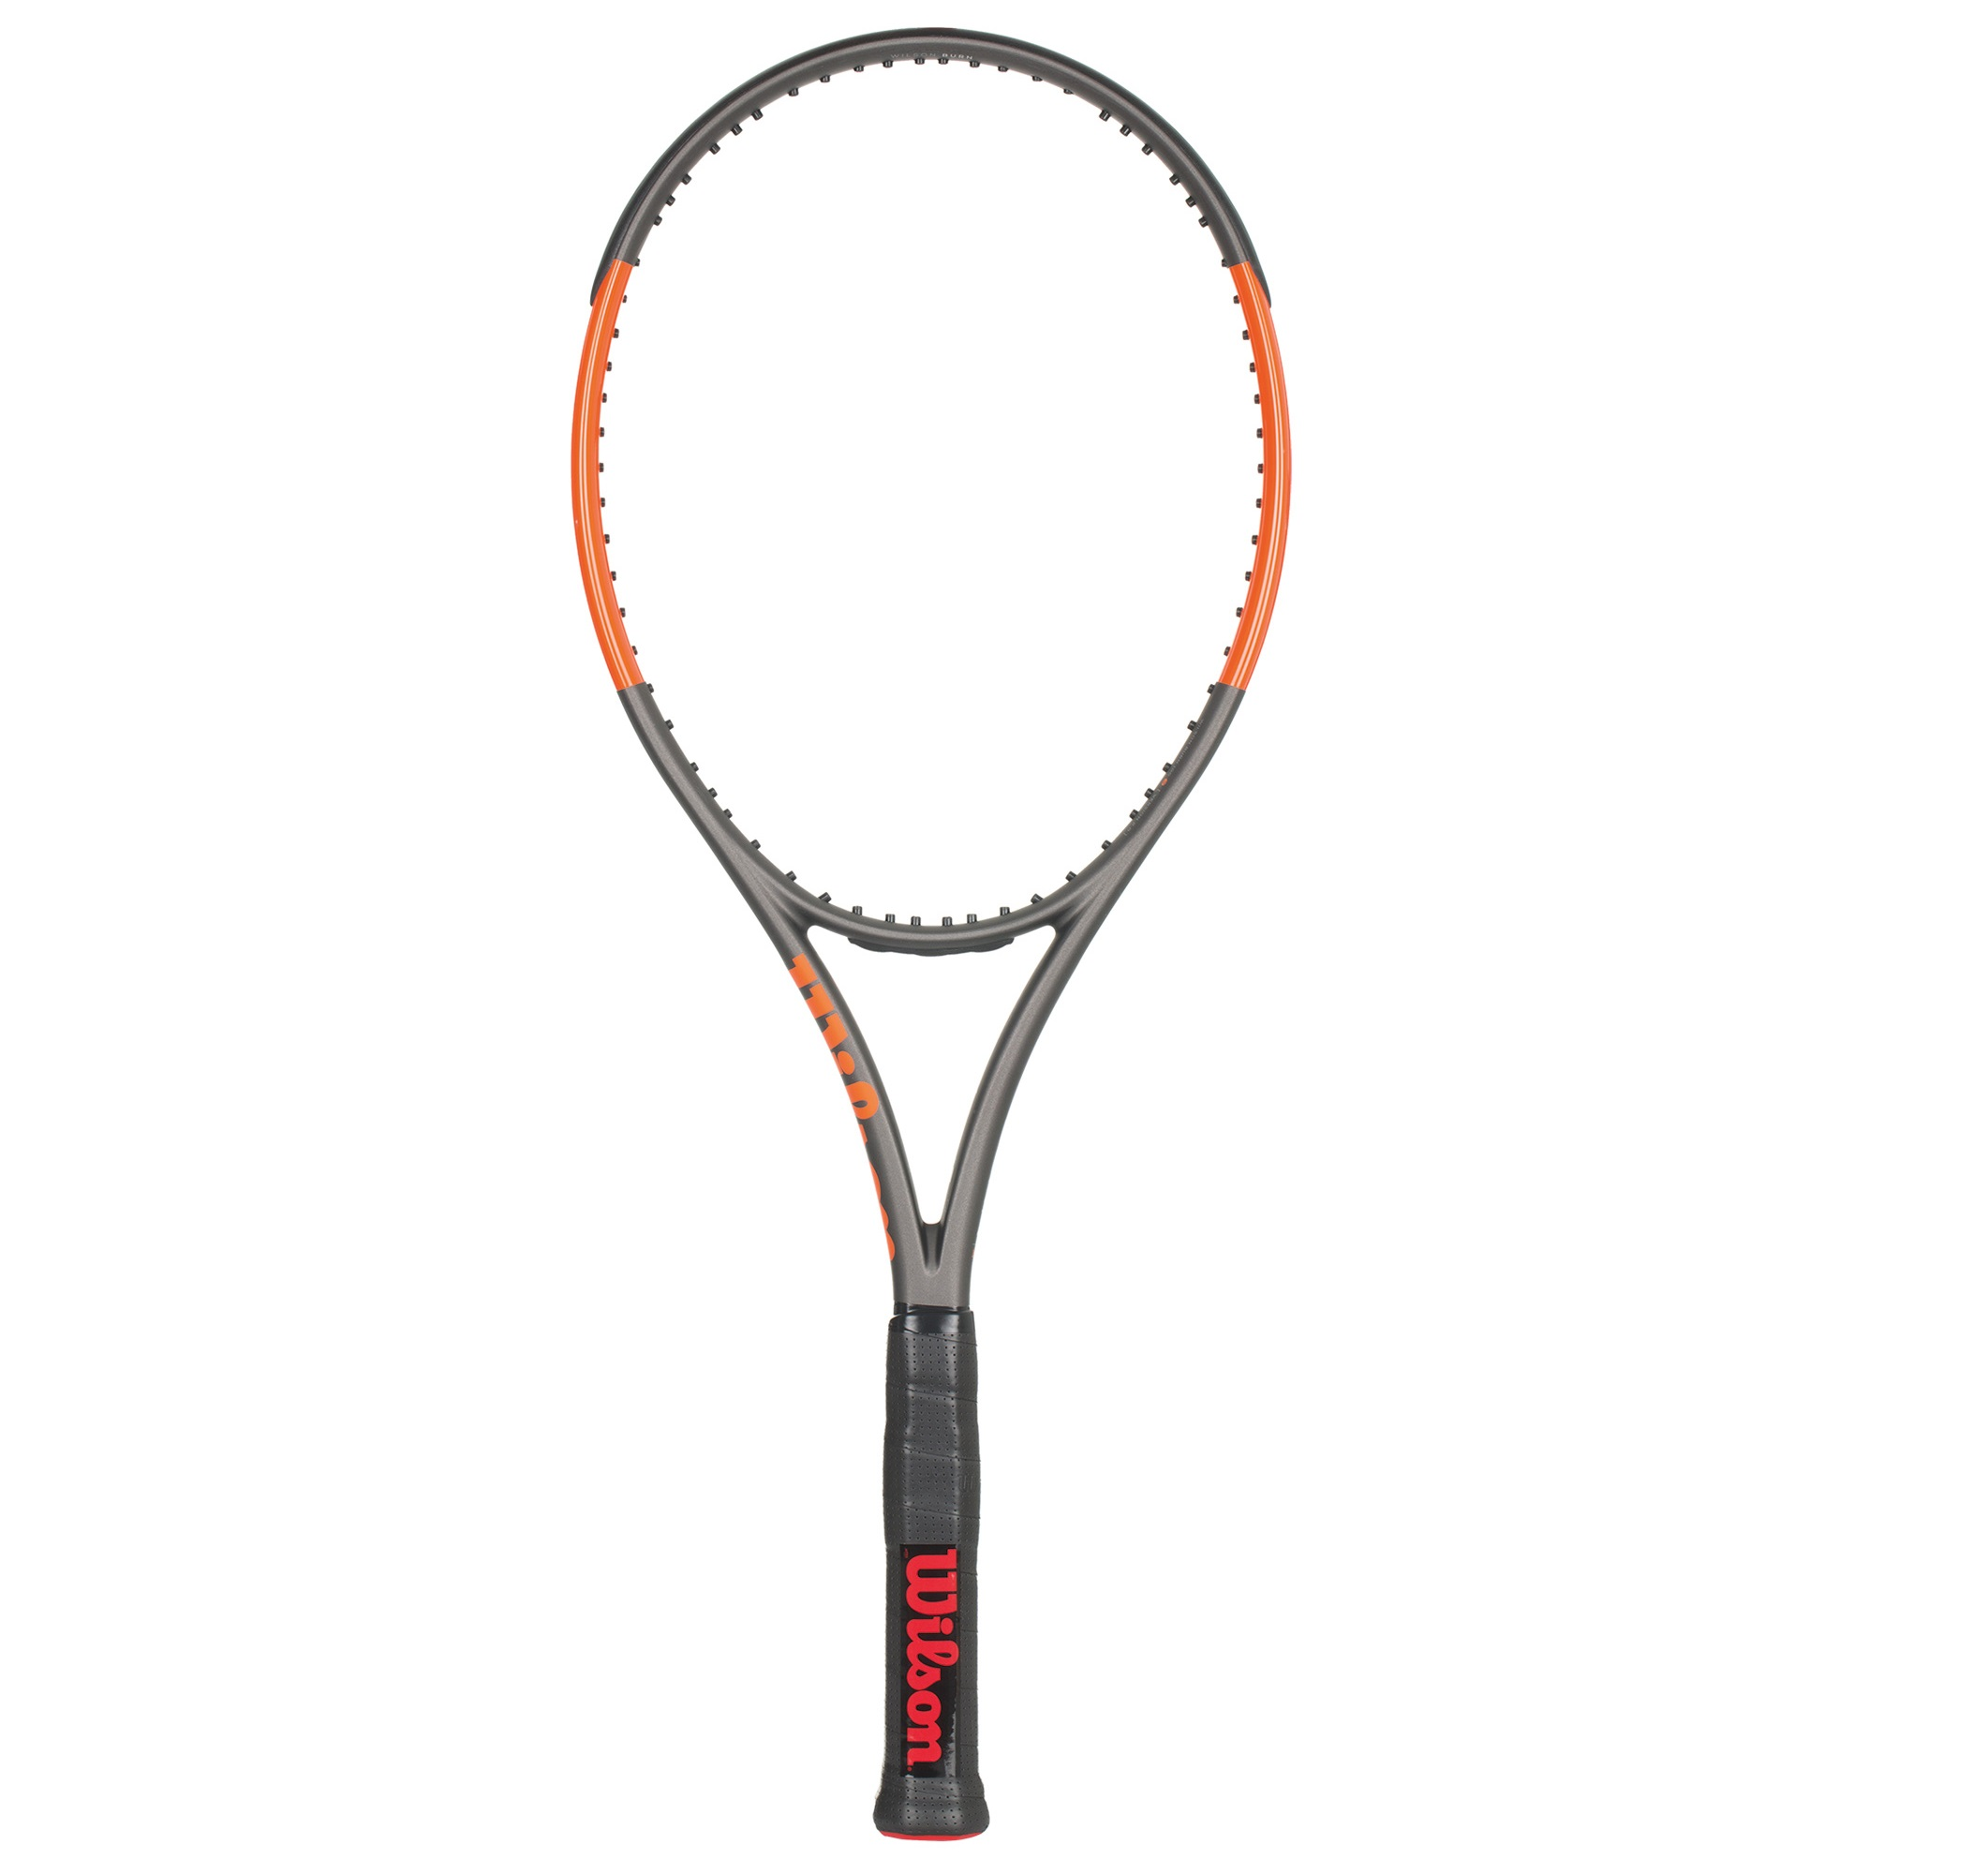 Wilson Ракетка для большого тенниса Wilson Burn 100 CV, размер 4 wilson набор мячей для большого тенниса wilson us open x3 размер без размера